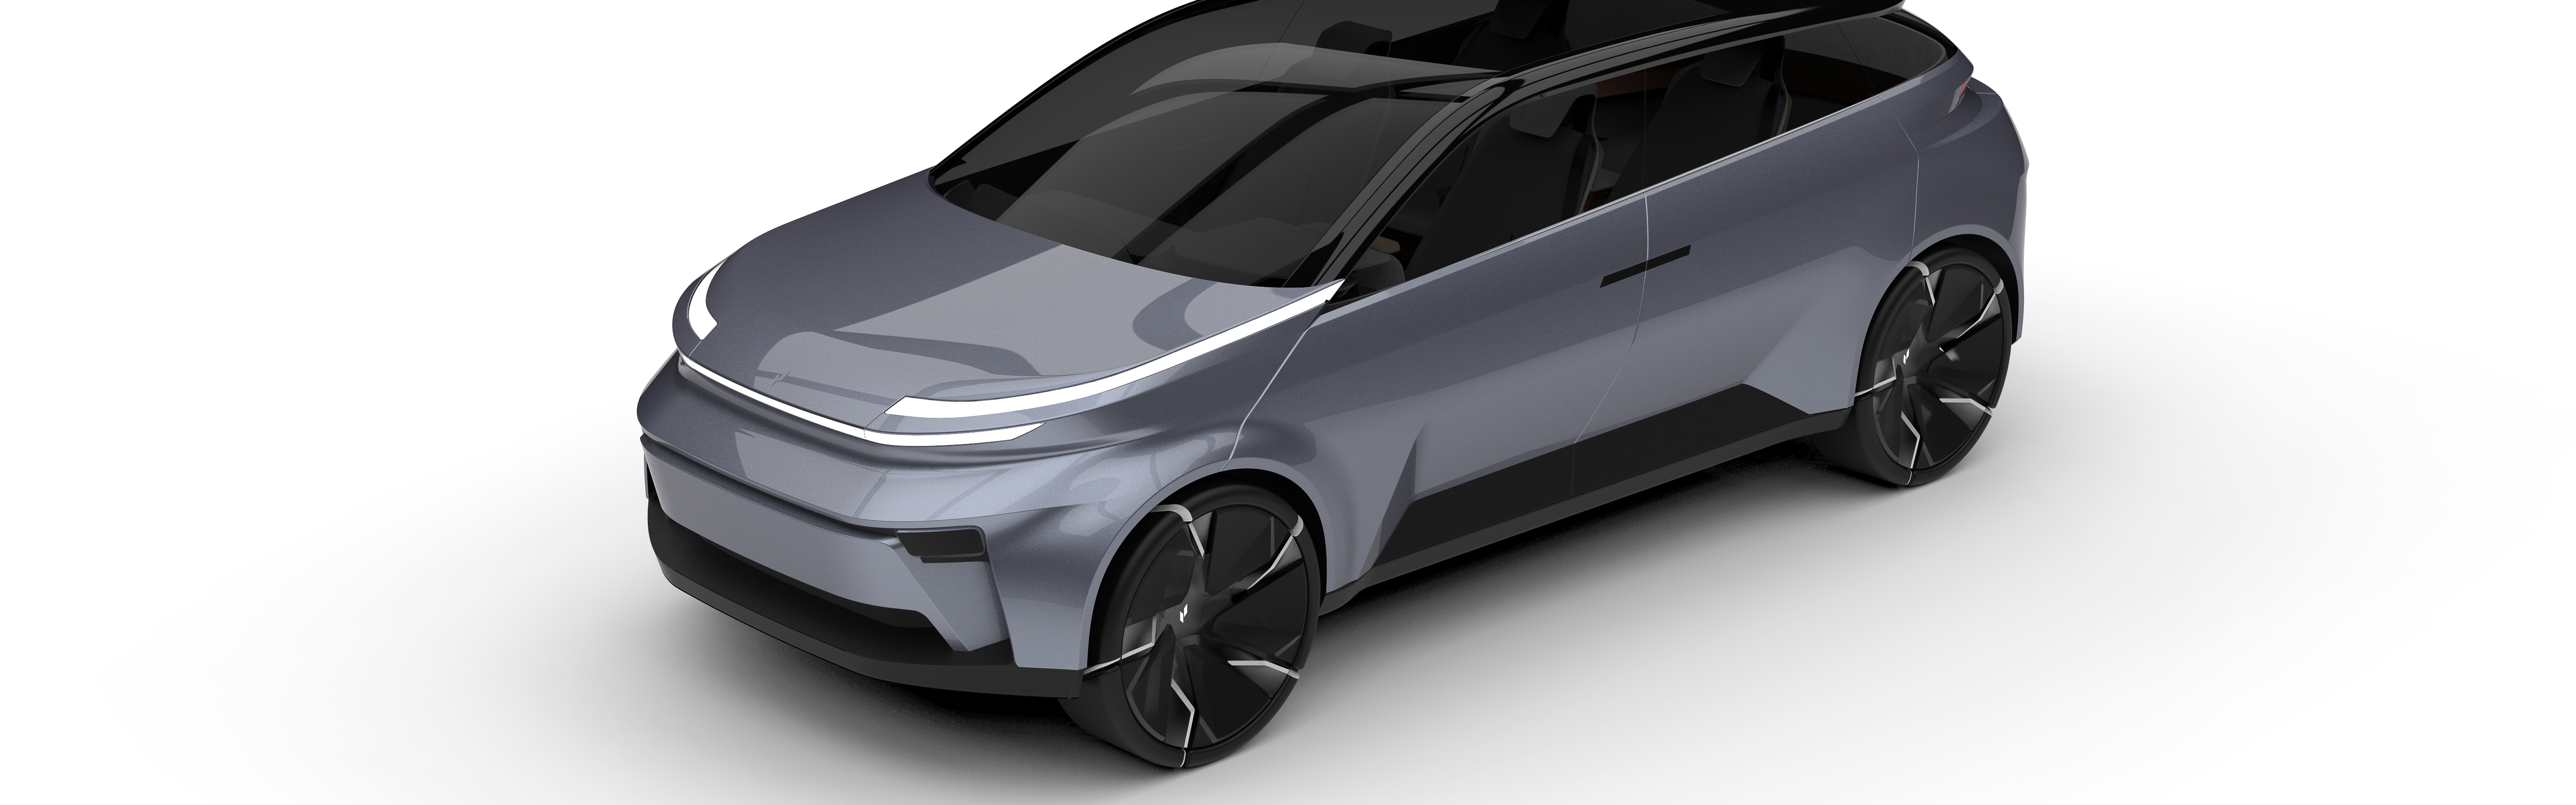 Vehicle Concept Angle 1